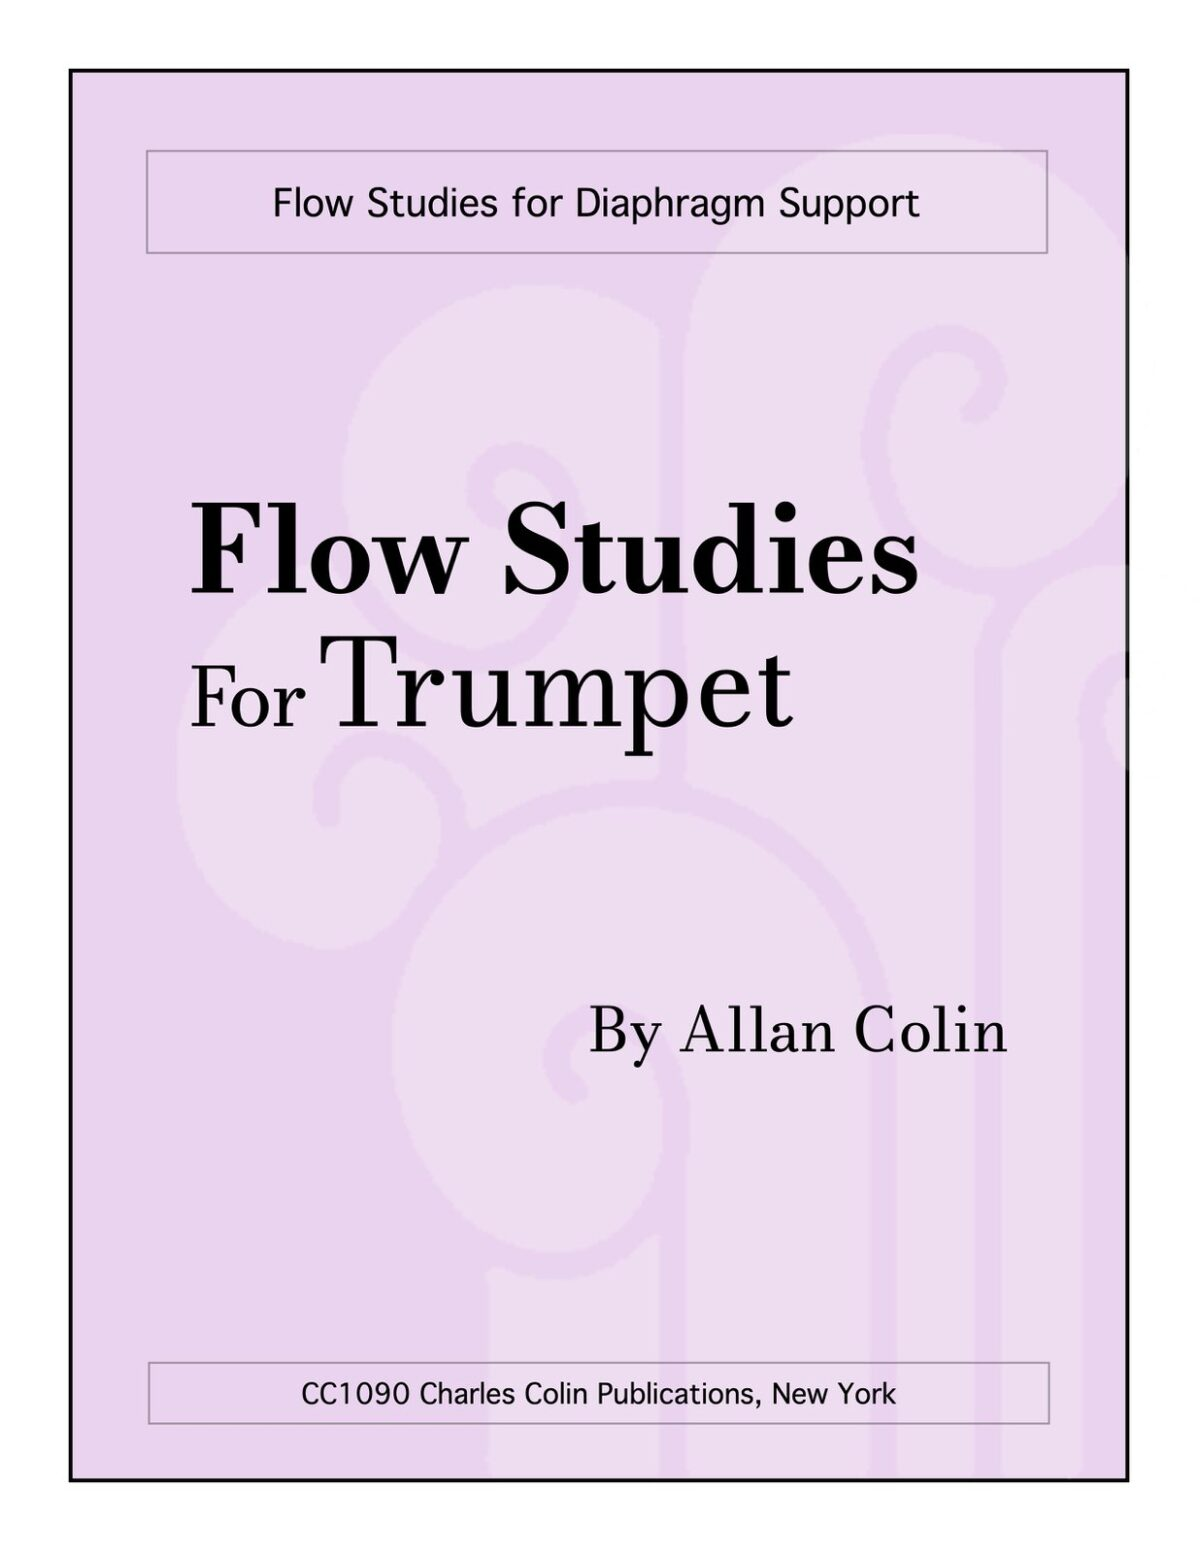 Colin, Flow Studies for Diaphragm Support-p01